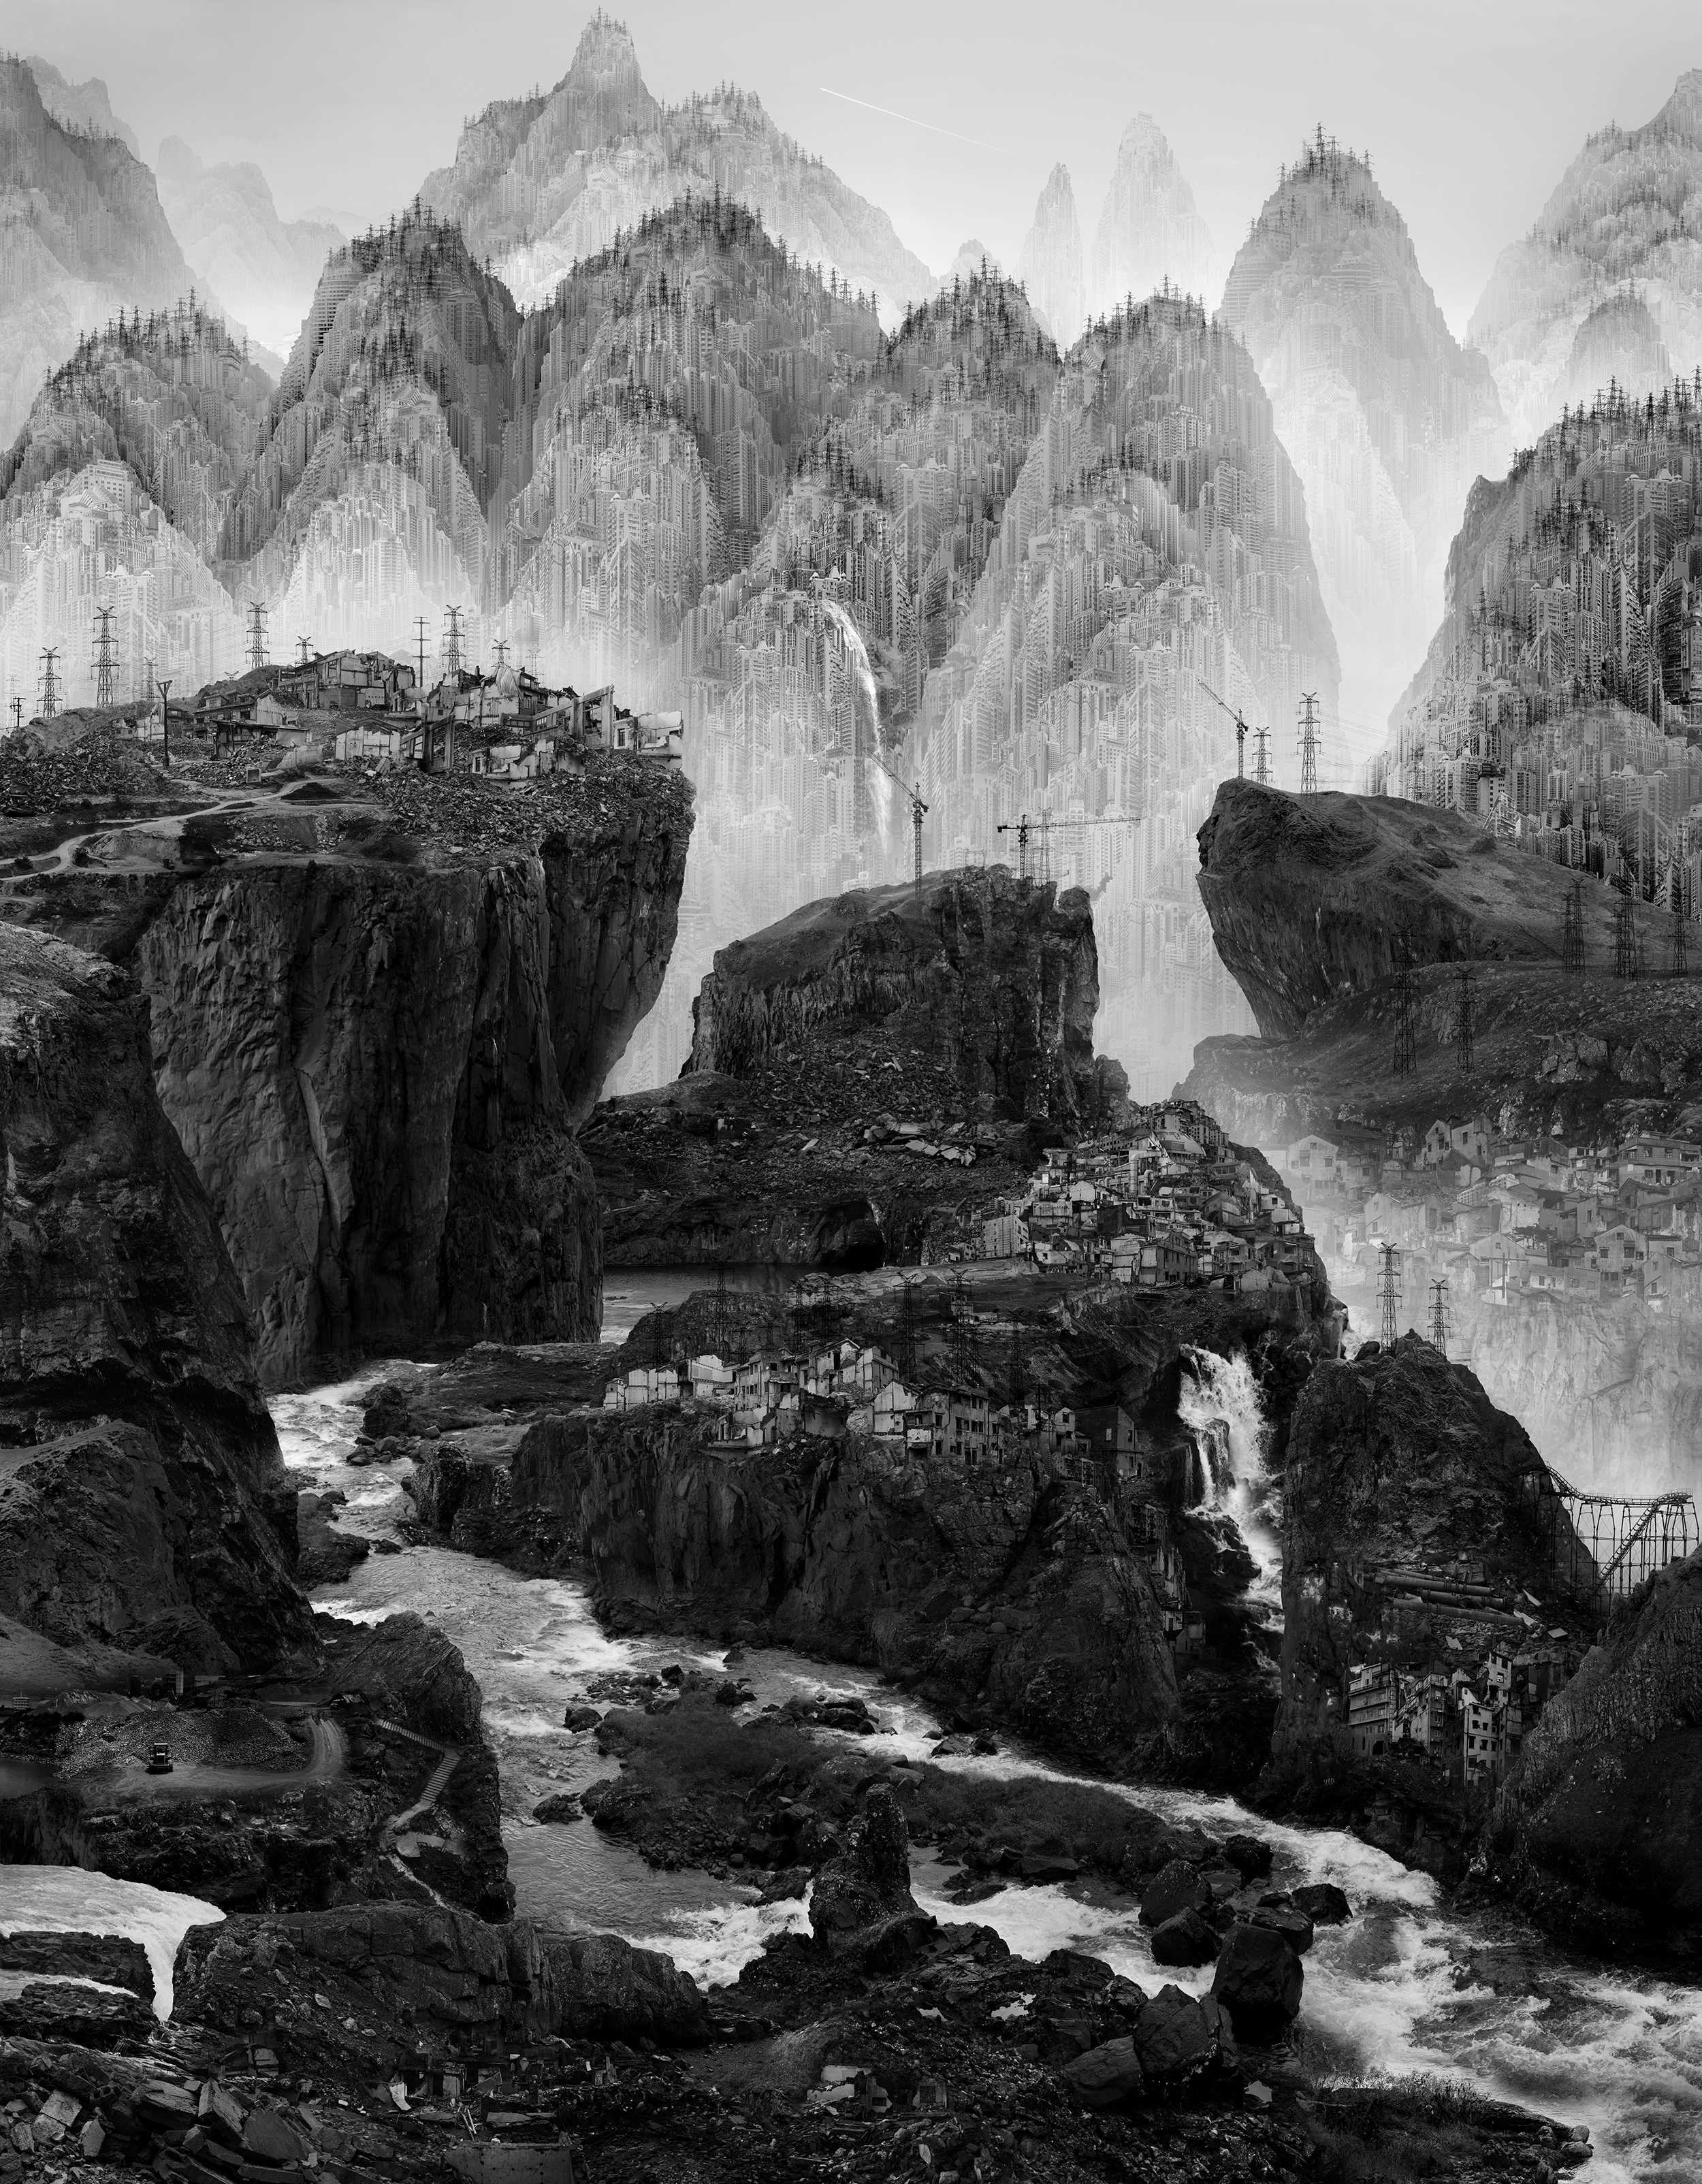 Courtesy of Yang Yongliang, (Chinese, 1980)